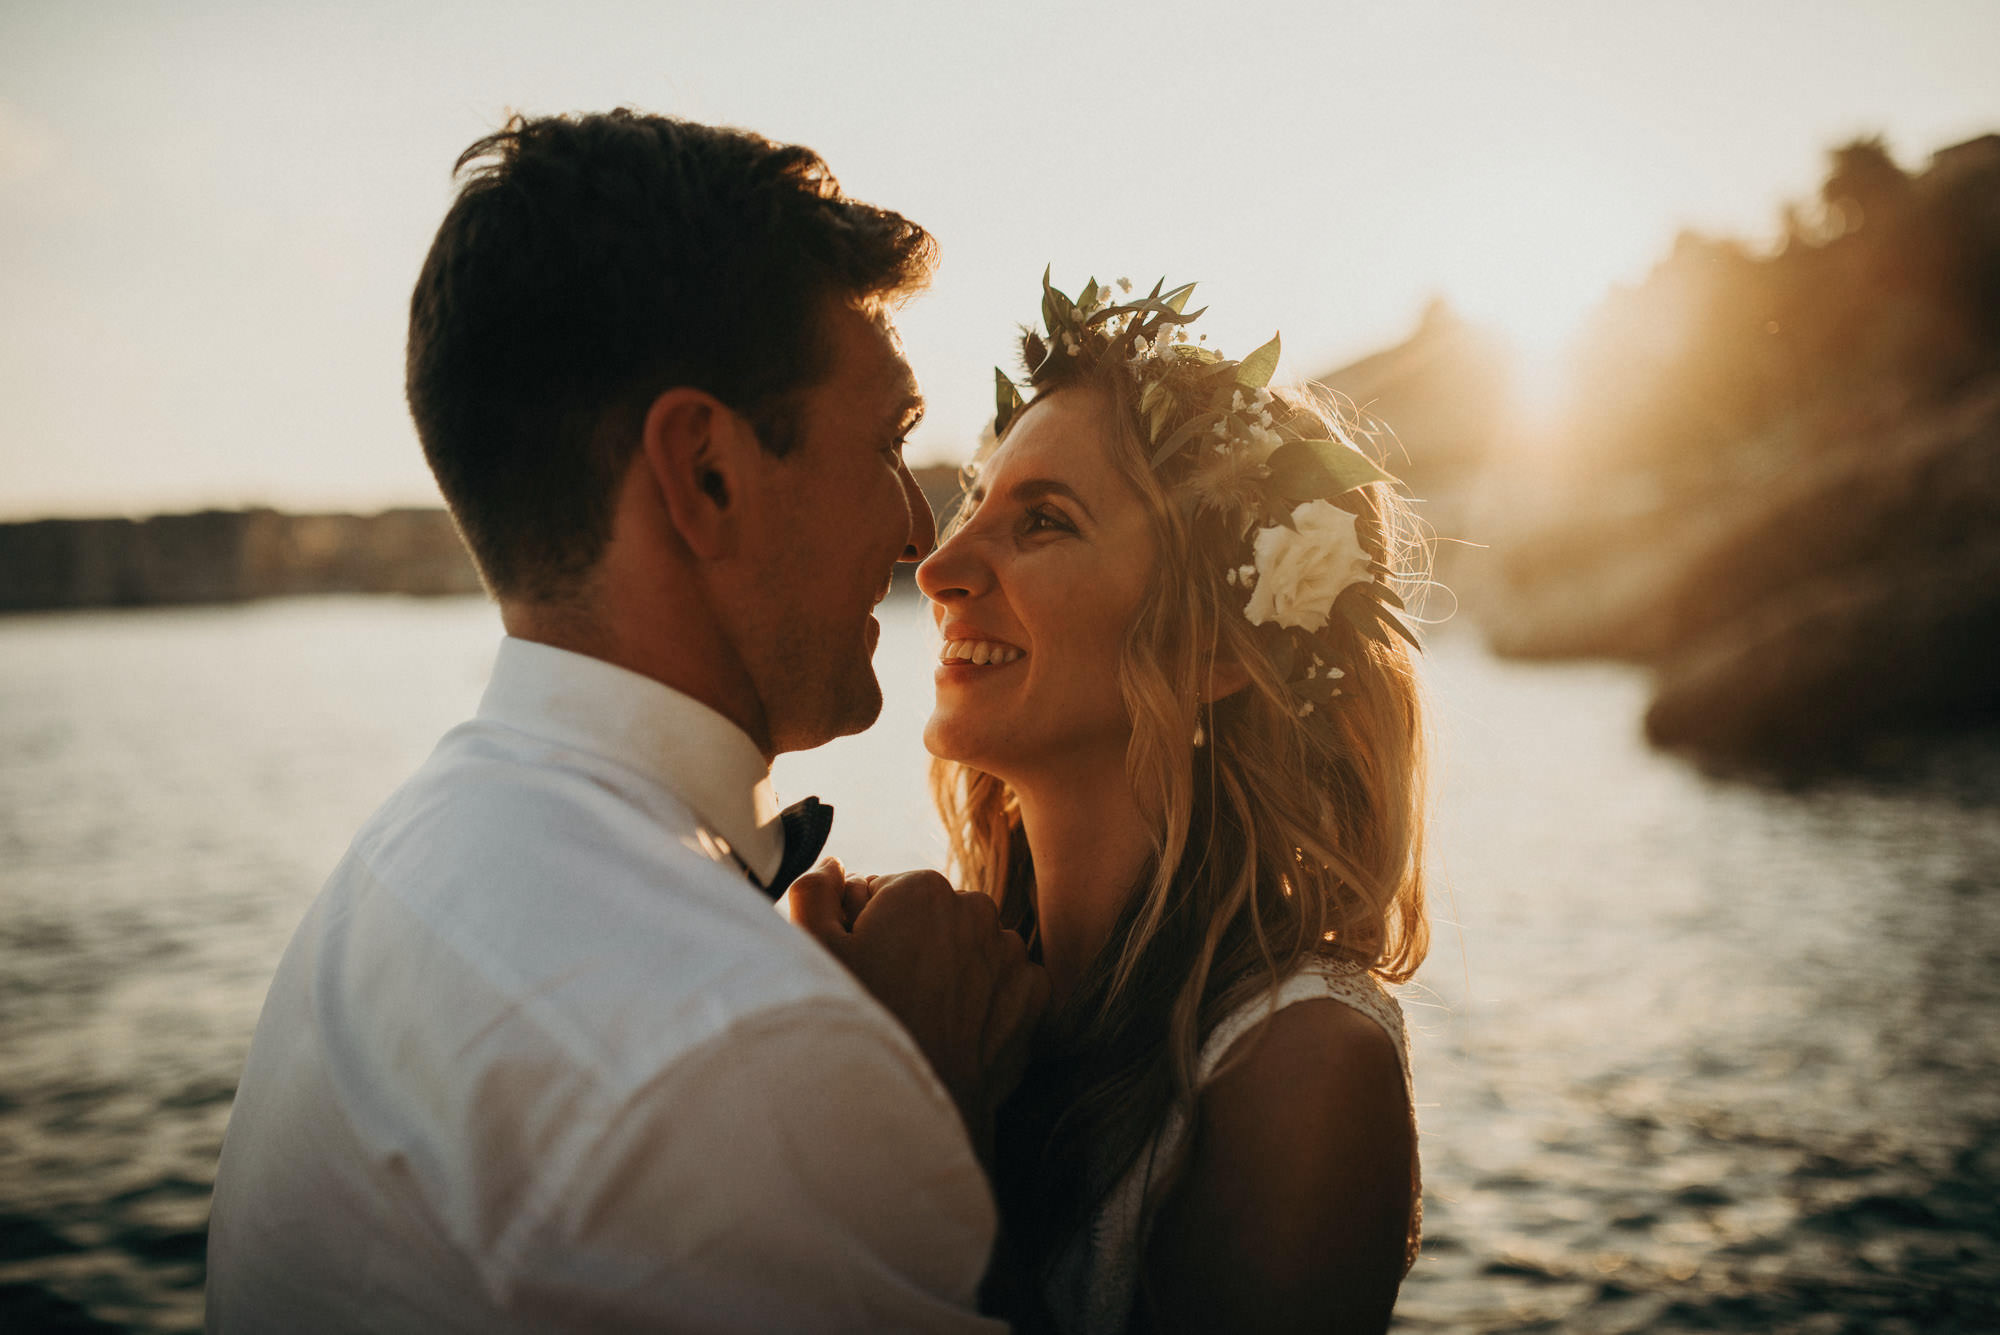 dubrovnik_croatia_wedding_photographer-jere_satamo-destination_weddings-080-web.jpg